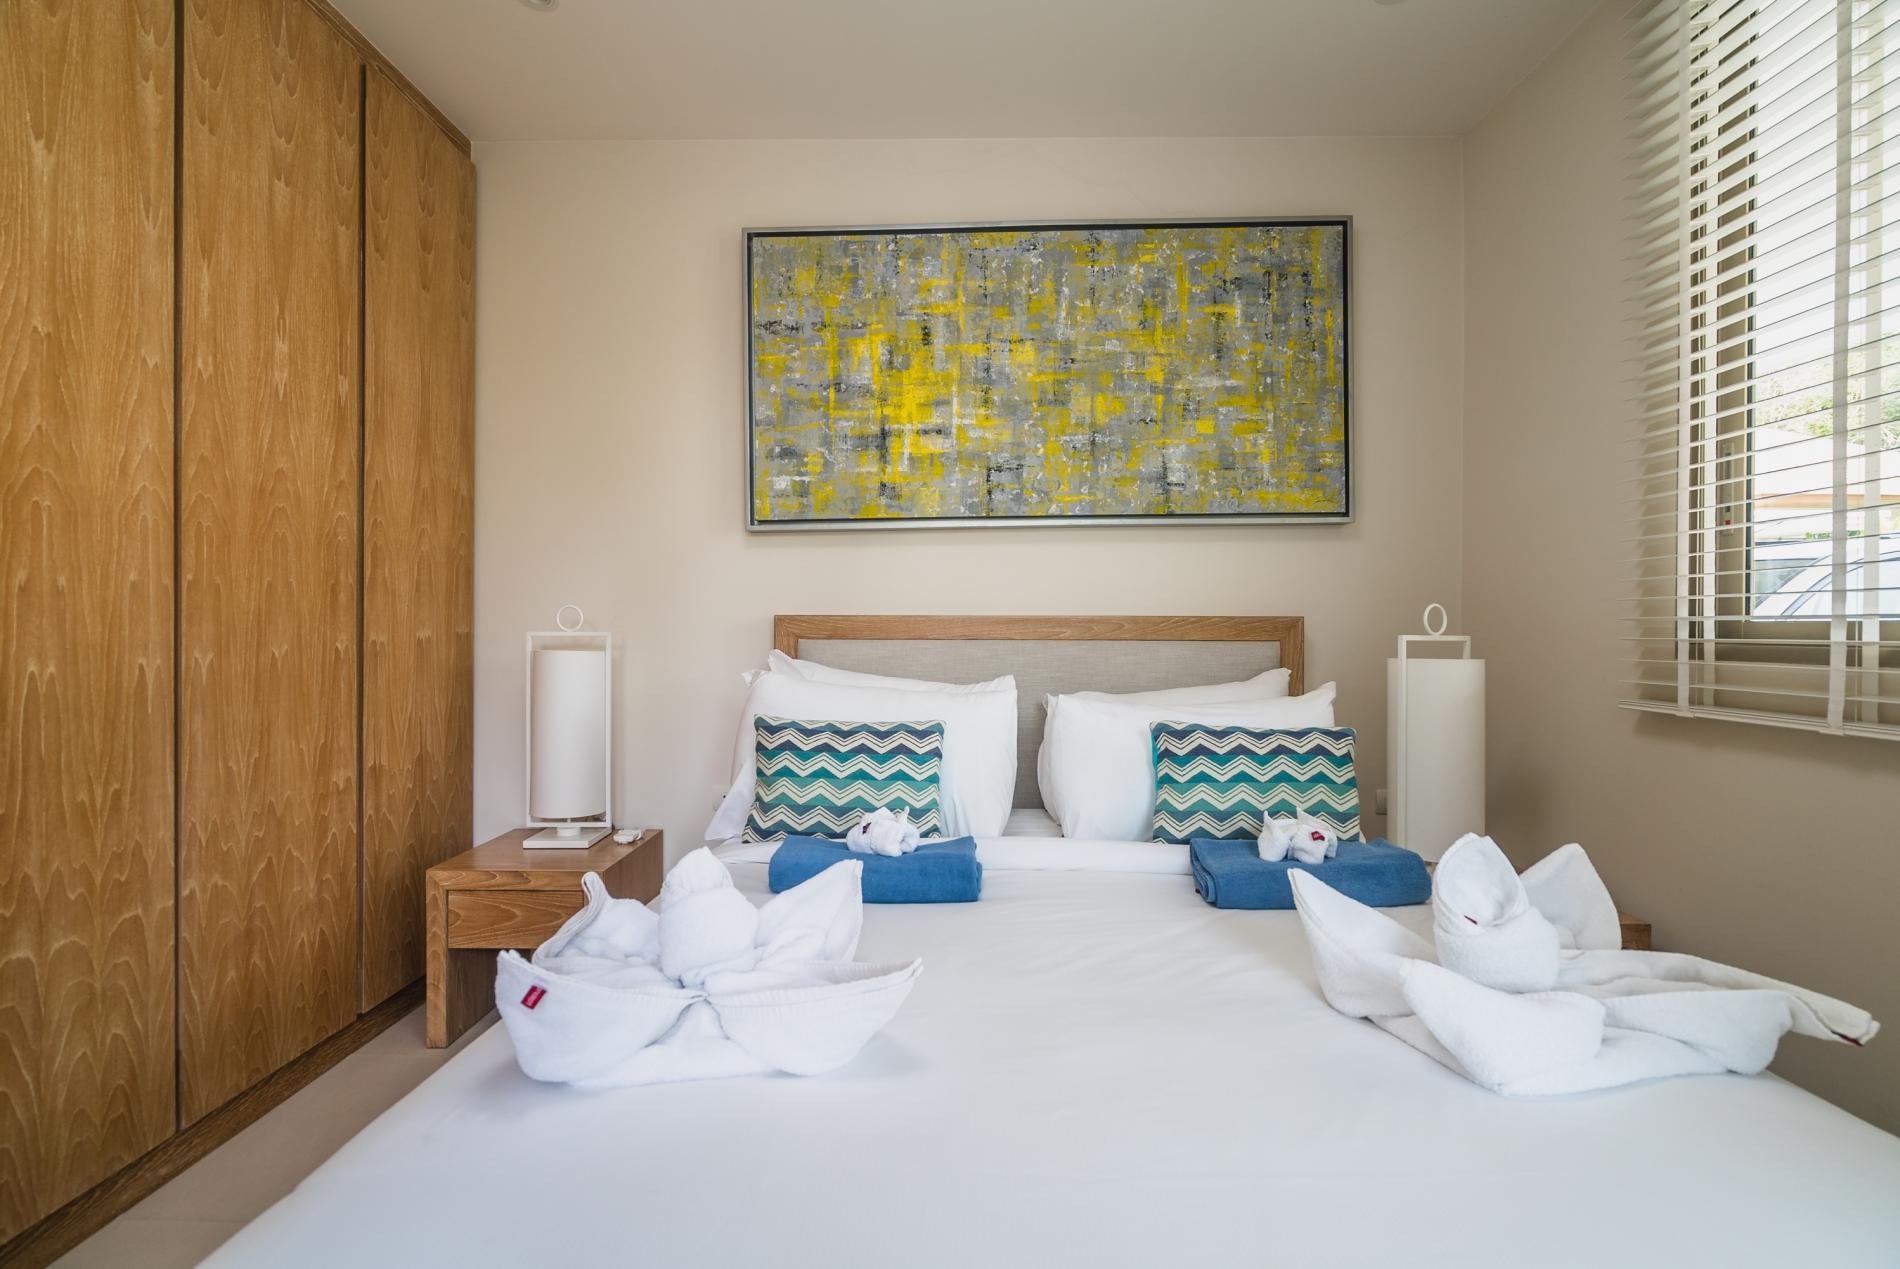 Trichada 18 - Private pool modern 3 bedroom villa photo 18131718